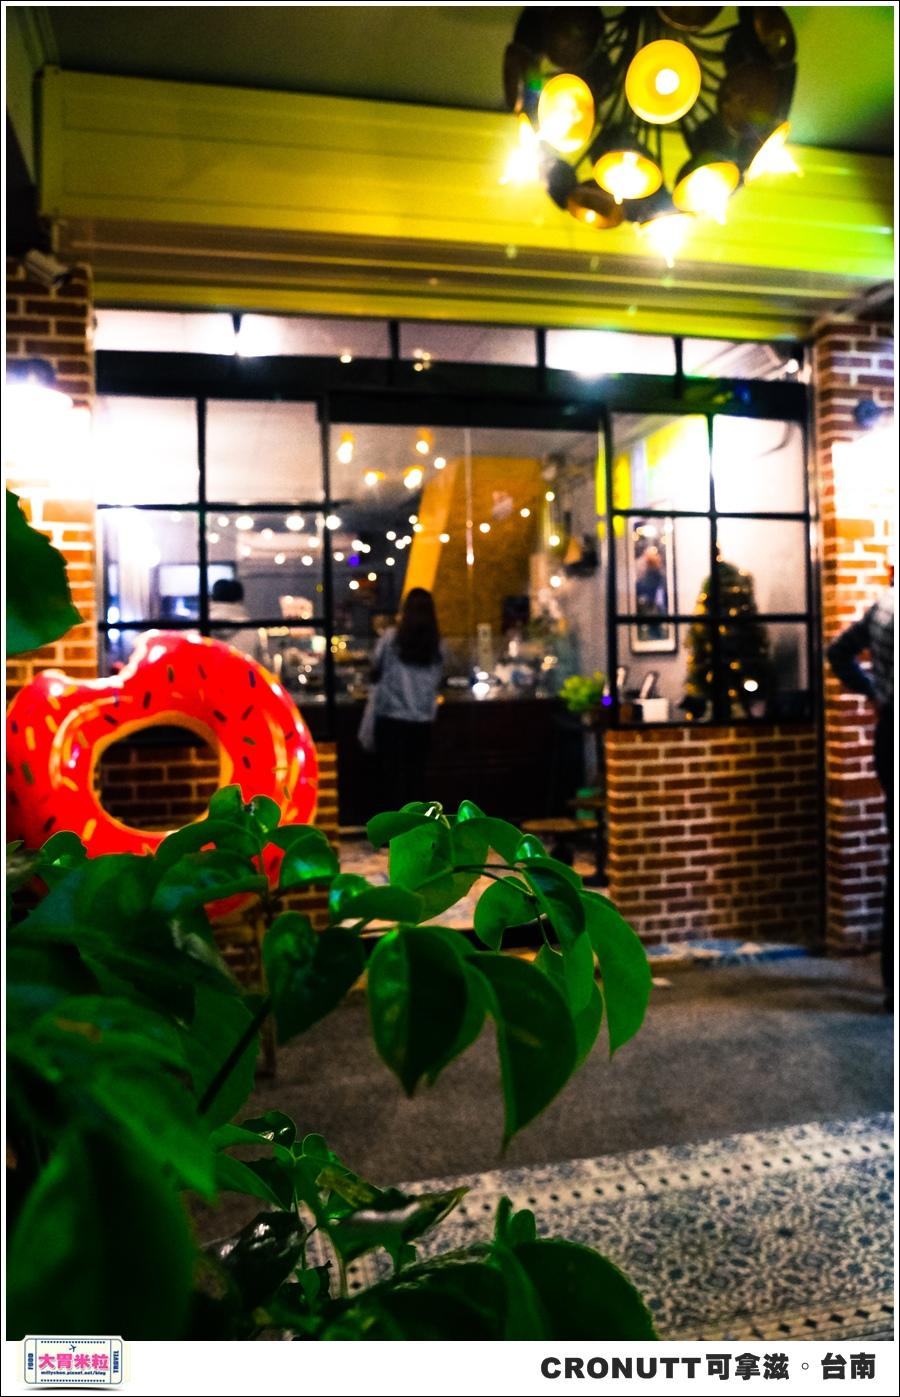 CRONUTT可拿滋台南店@紐約可頌甜甜圈@大胃米粒0002.jpg